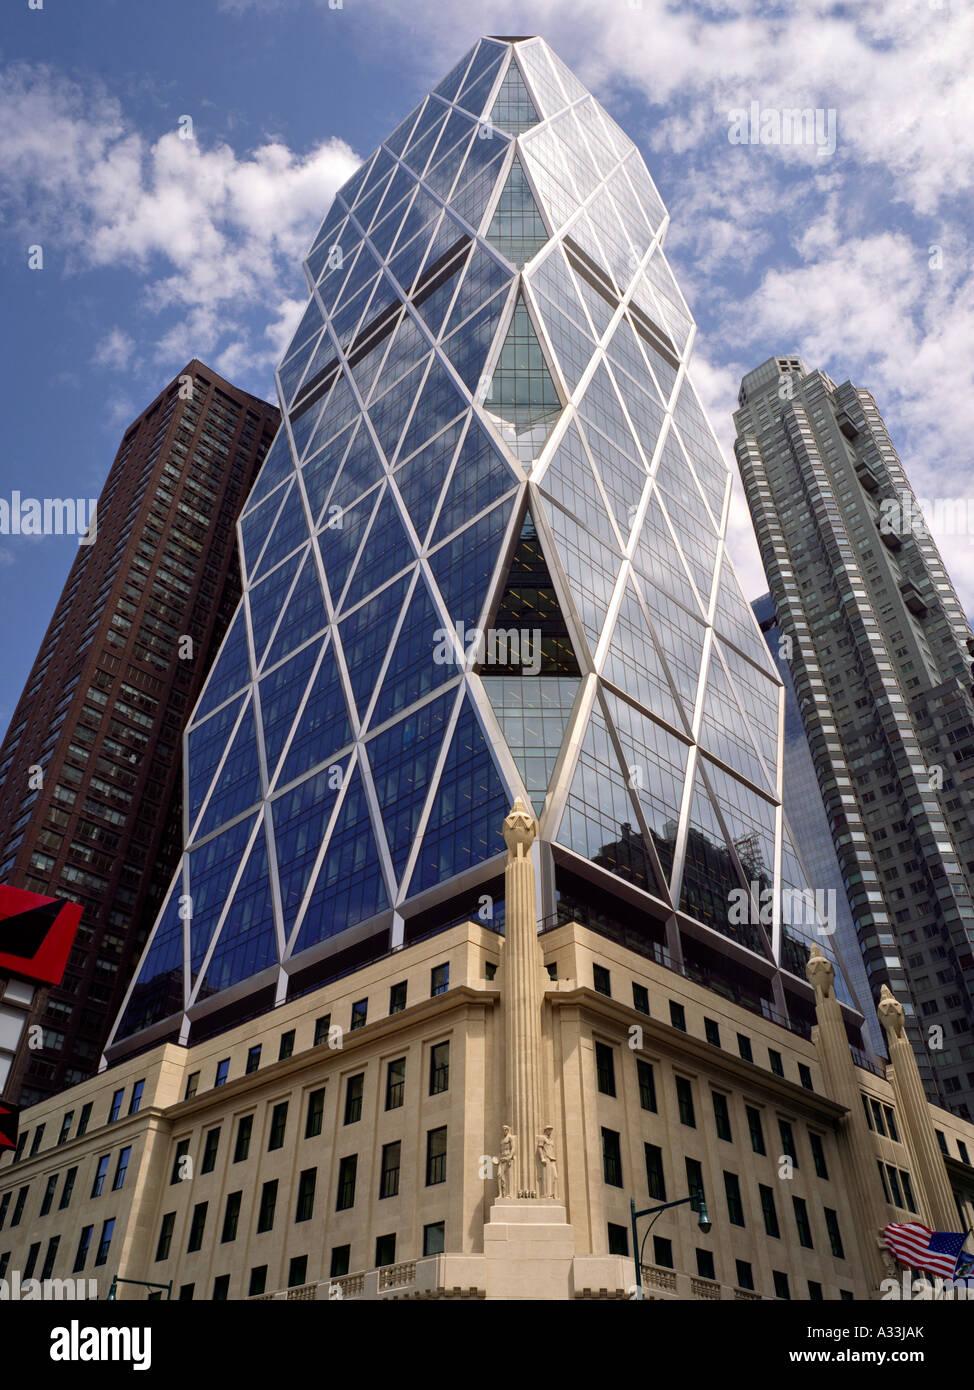 Hearst Tower, 300 West 57th Street, New York. 2006-Architekt: Foster + Partners Stockbild